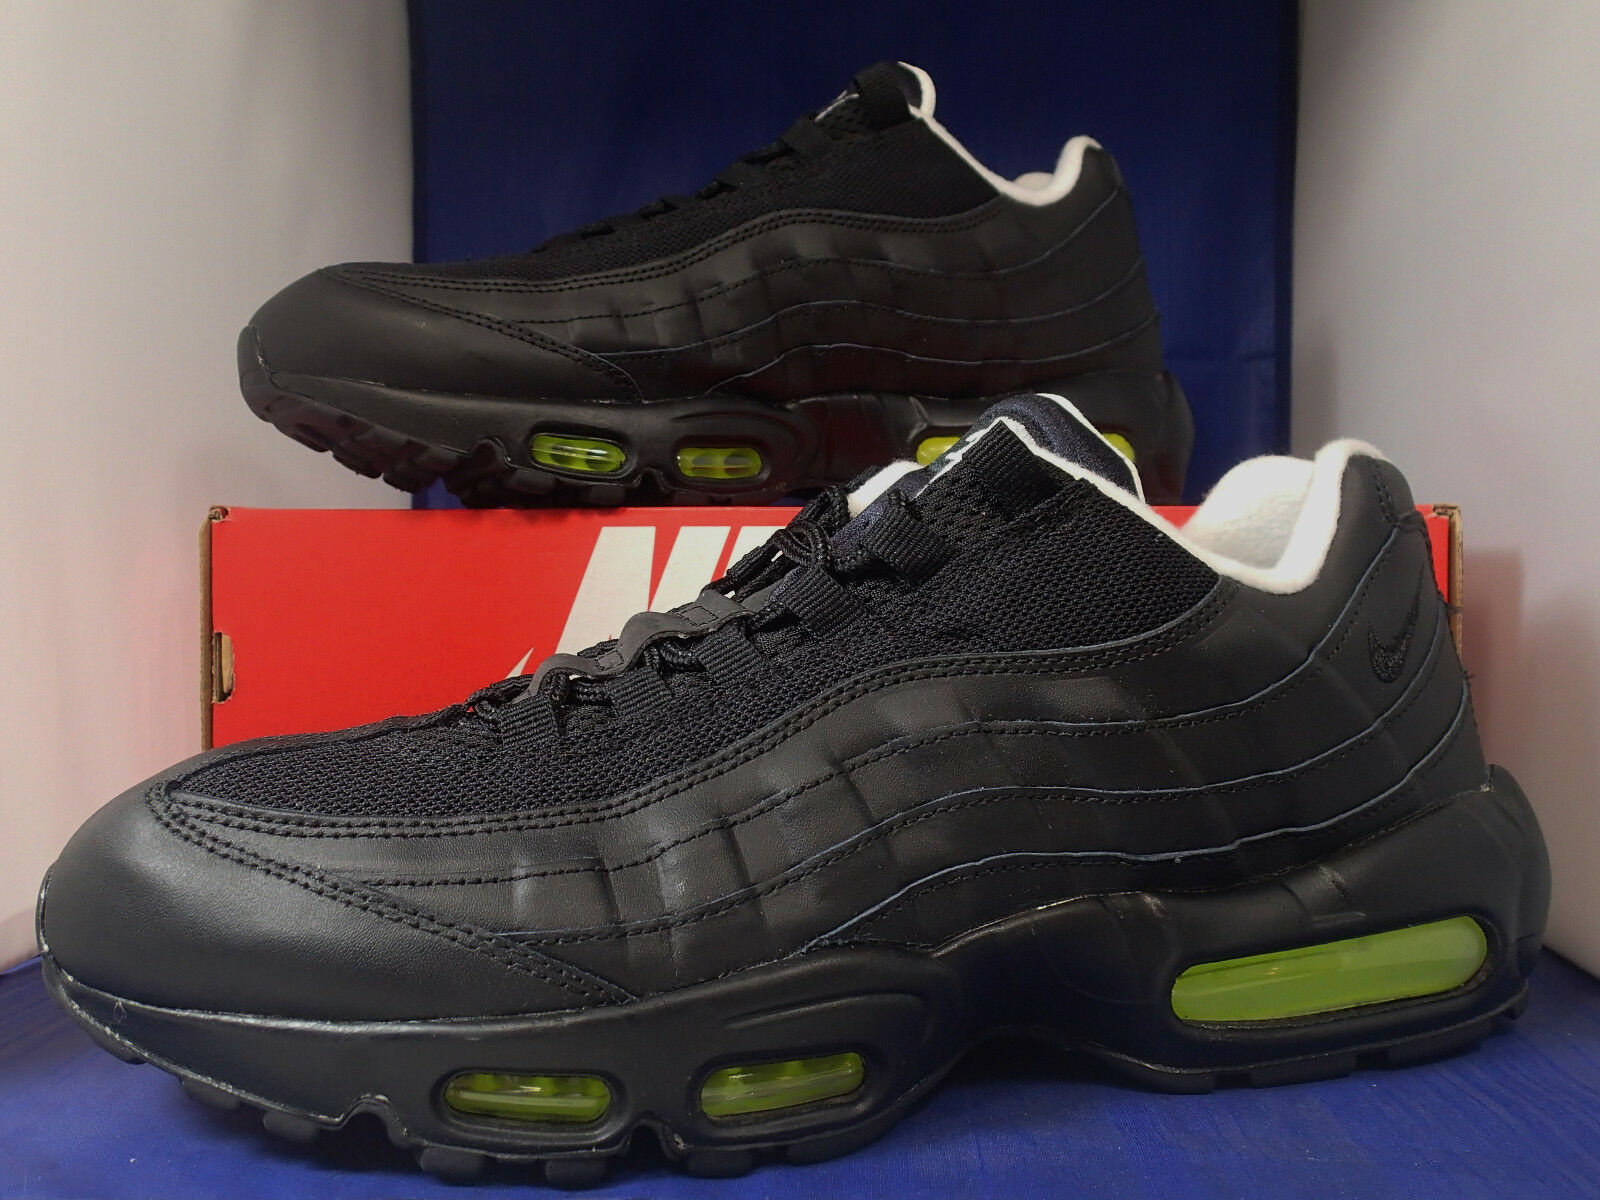 Nike air max 95 id schwarz - - weiß - volt - - sz - 11 (818592-992) 6a685a